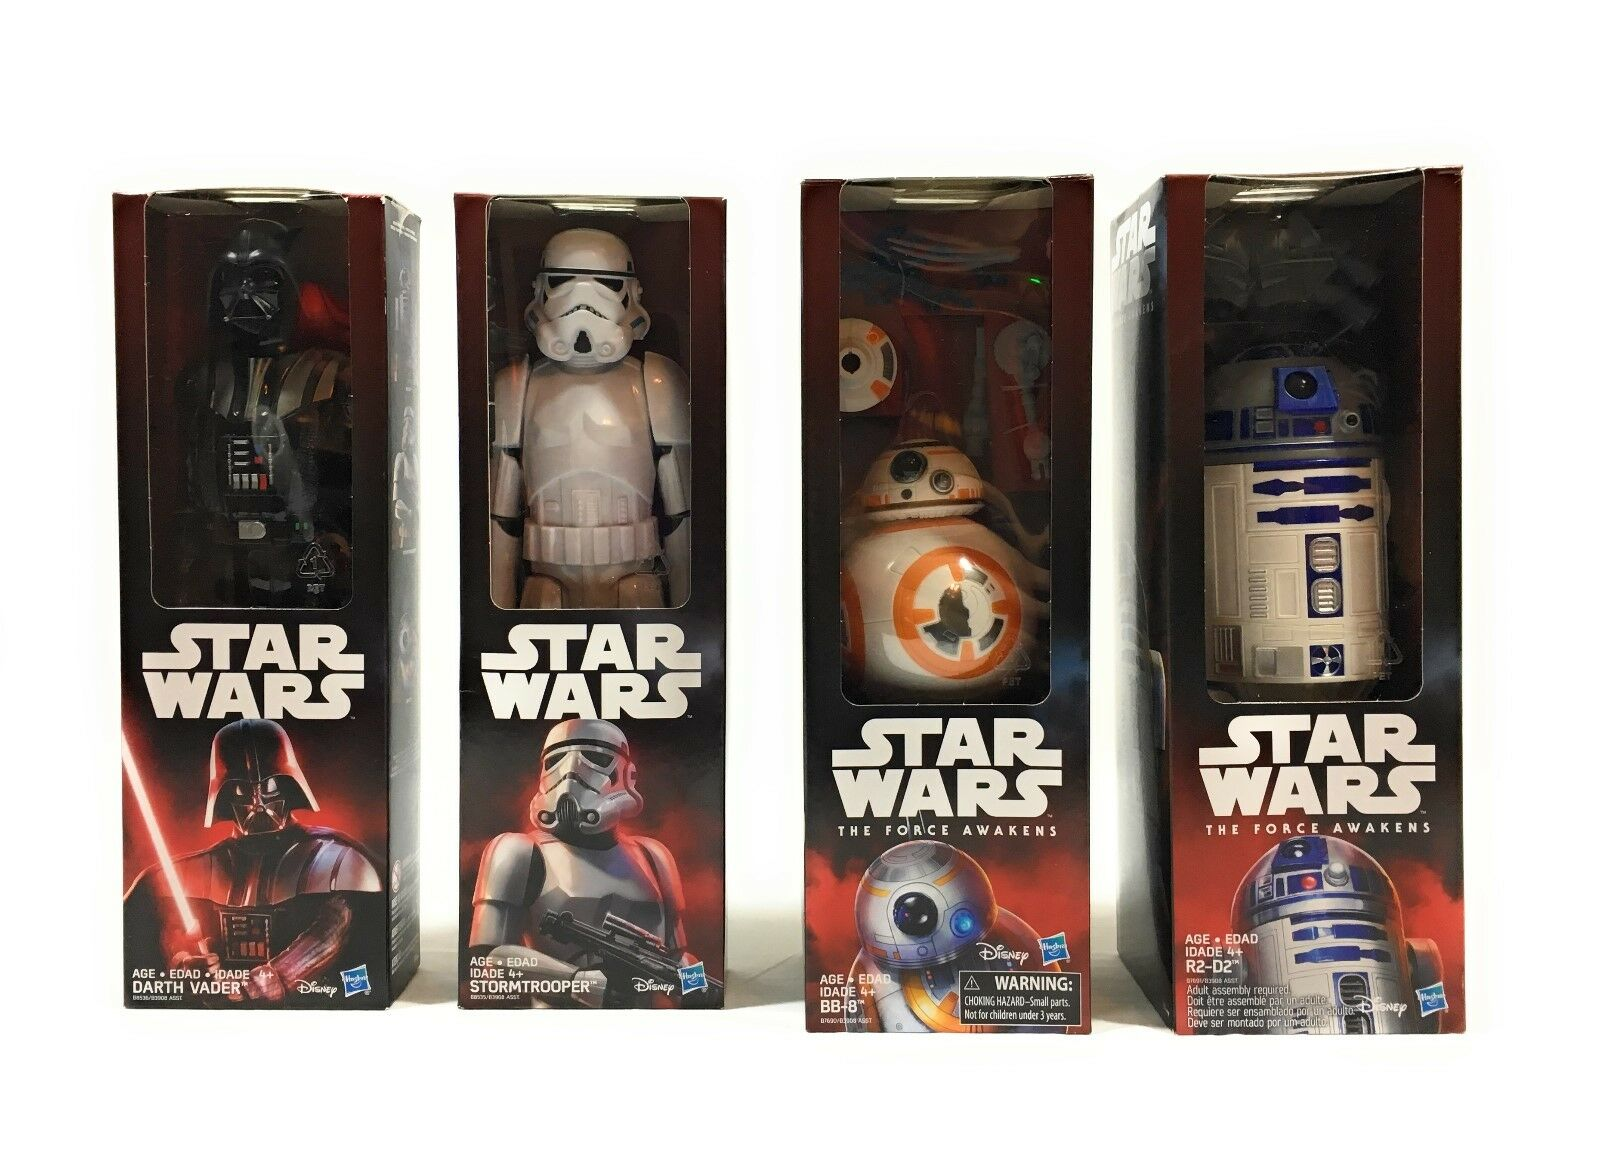 Star Wars The Force Awakens Figures Lot R2 D2, Darth Vader, BB8, Storm Trooper